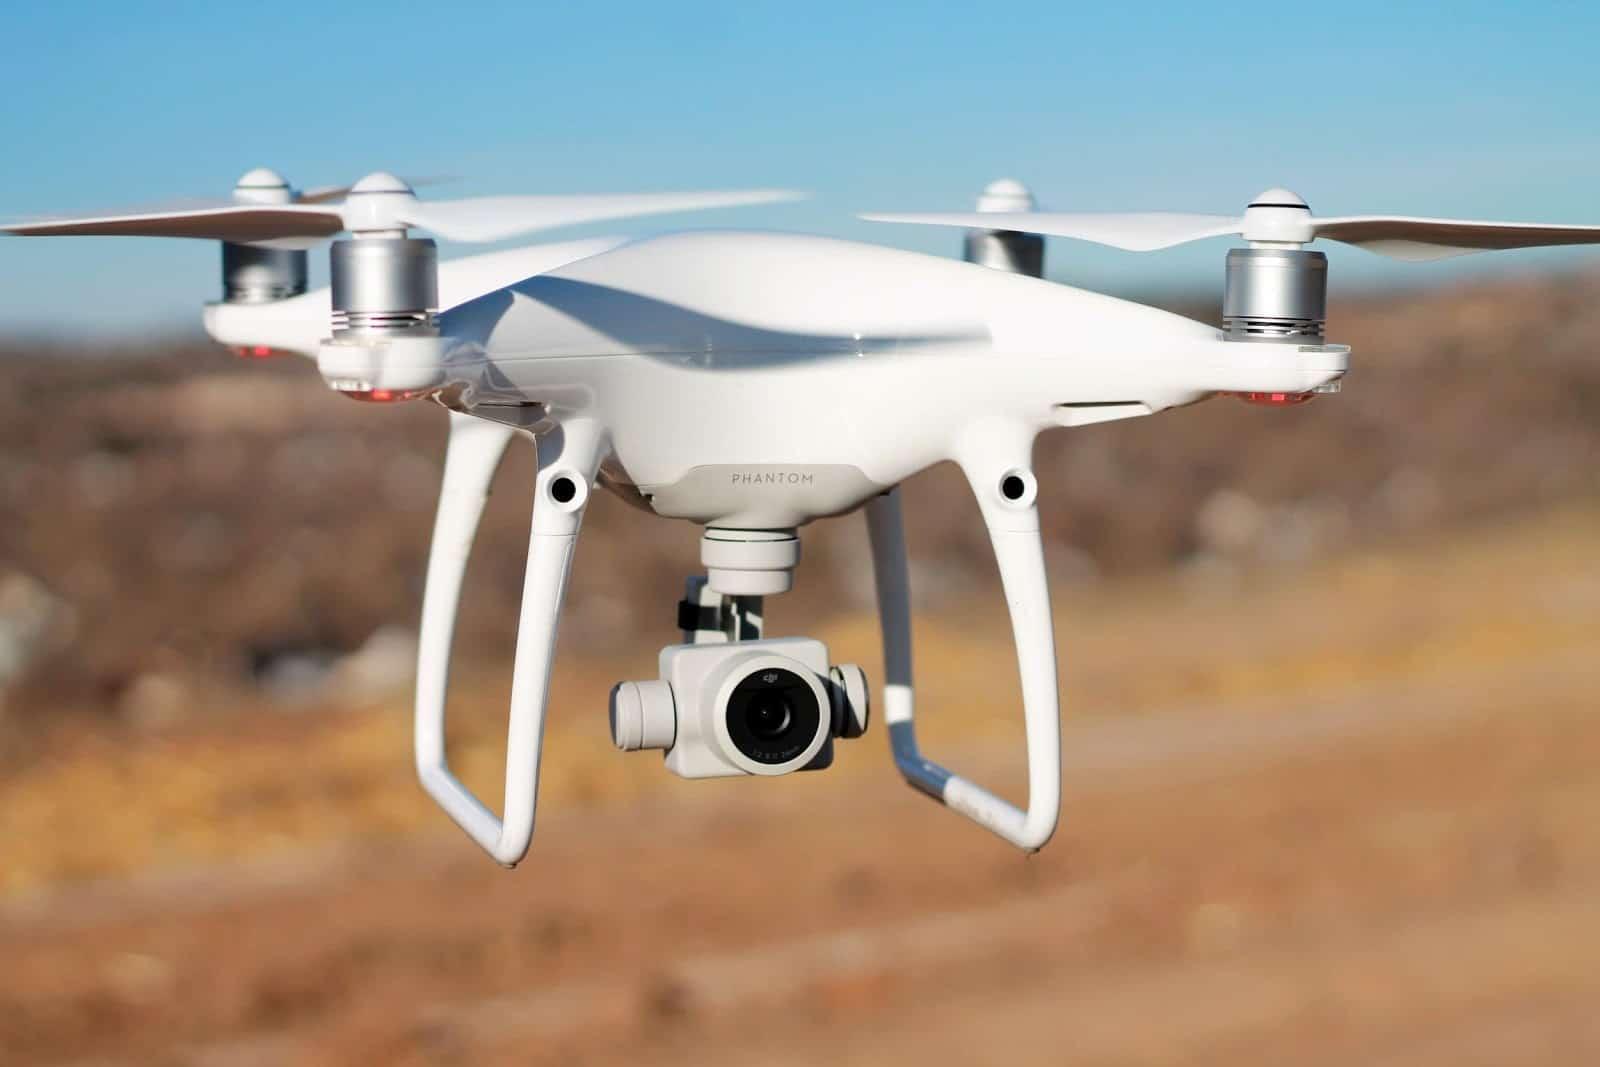 phantom drone flies in clear sky